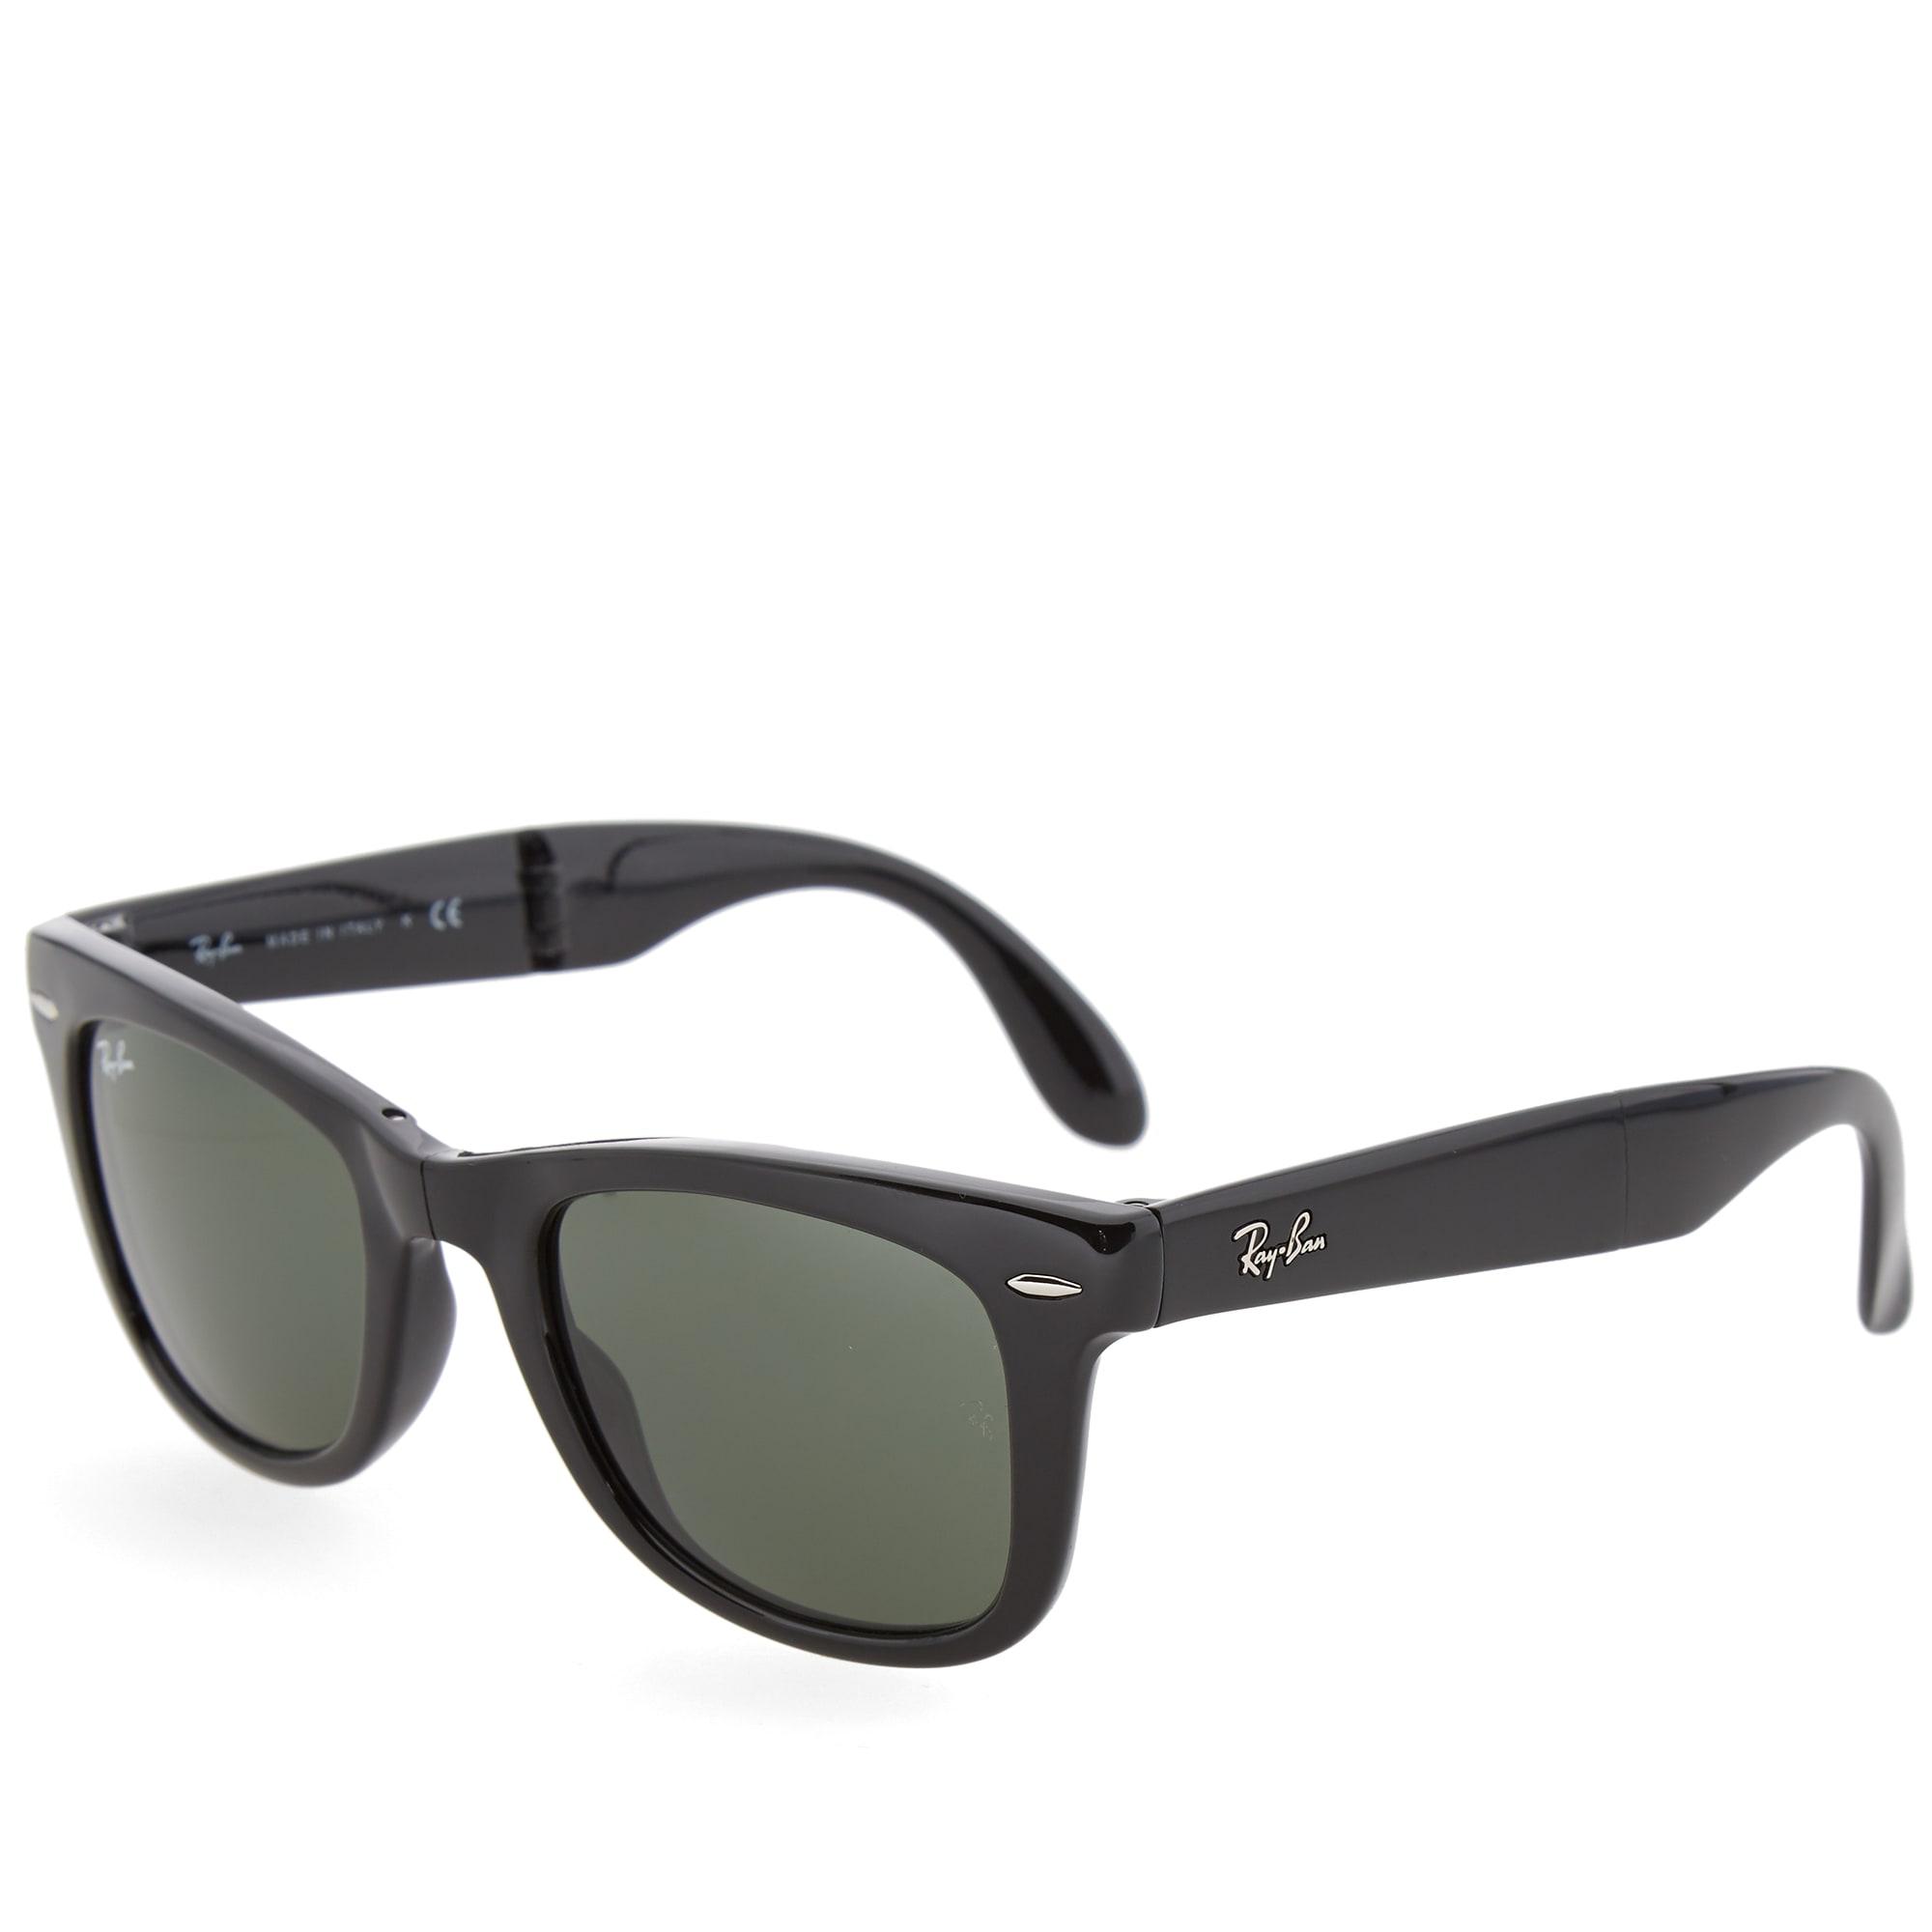 5bf3dbaf2f Fake Ray Ban Folding Wayfarer Sunglasses | www.tapdance.org